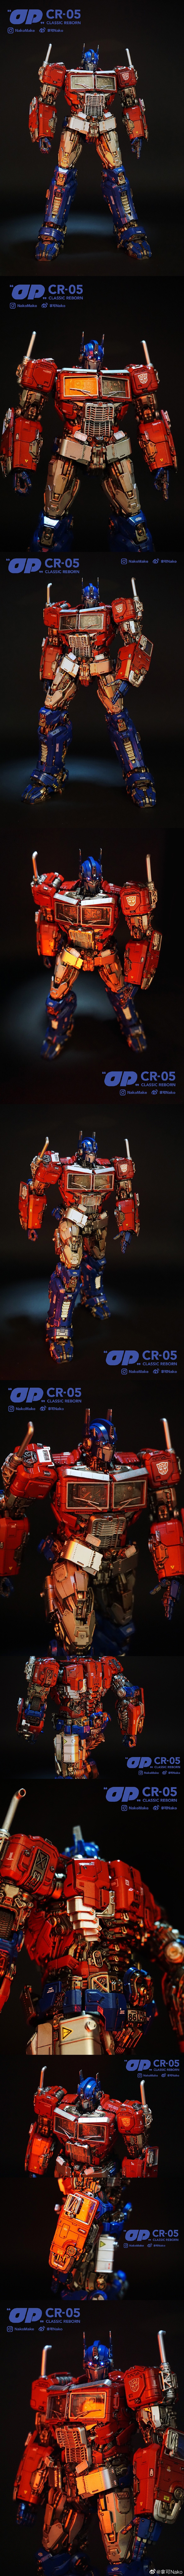 G798_NakoMake_Optimus_Prime_BUMBLEBEE_ver_GK_028.jpg